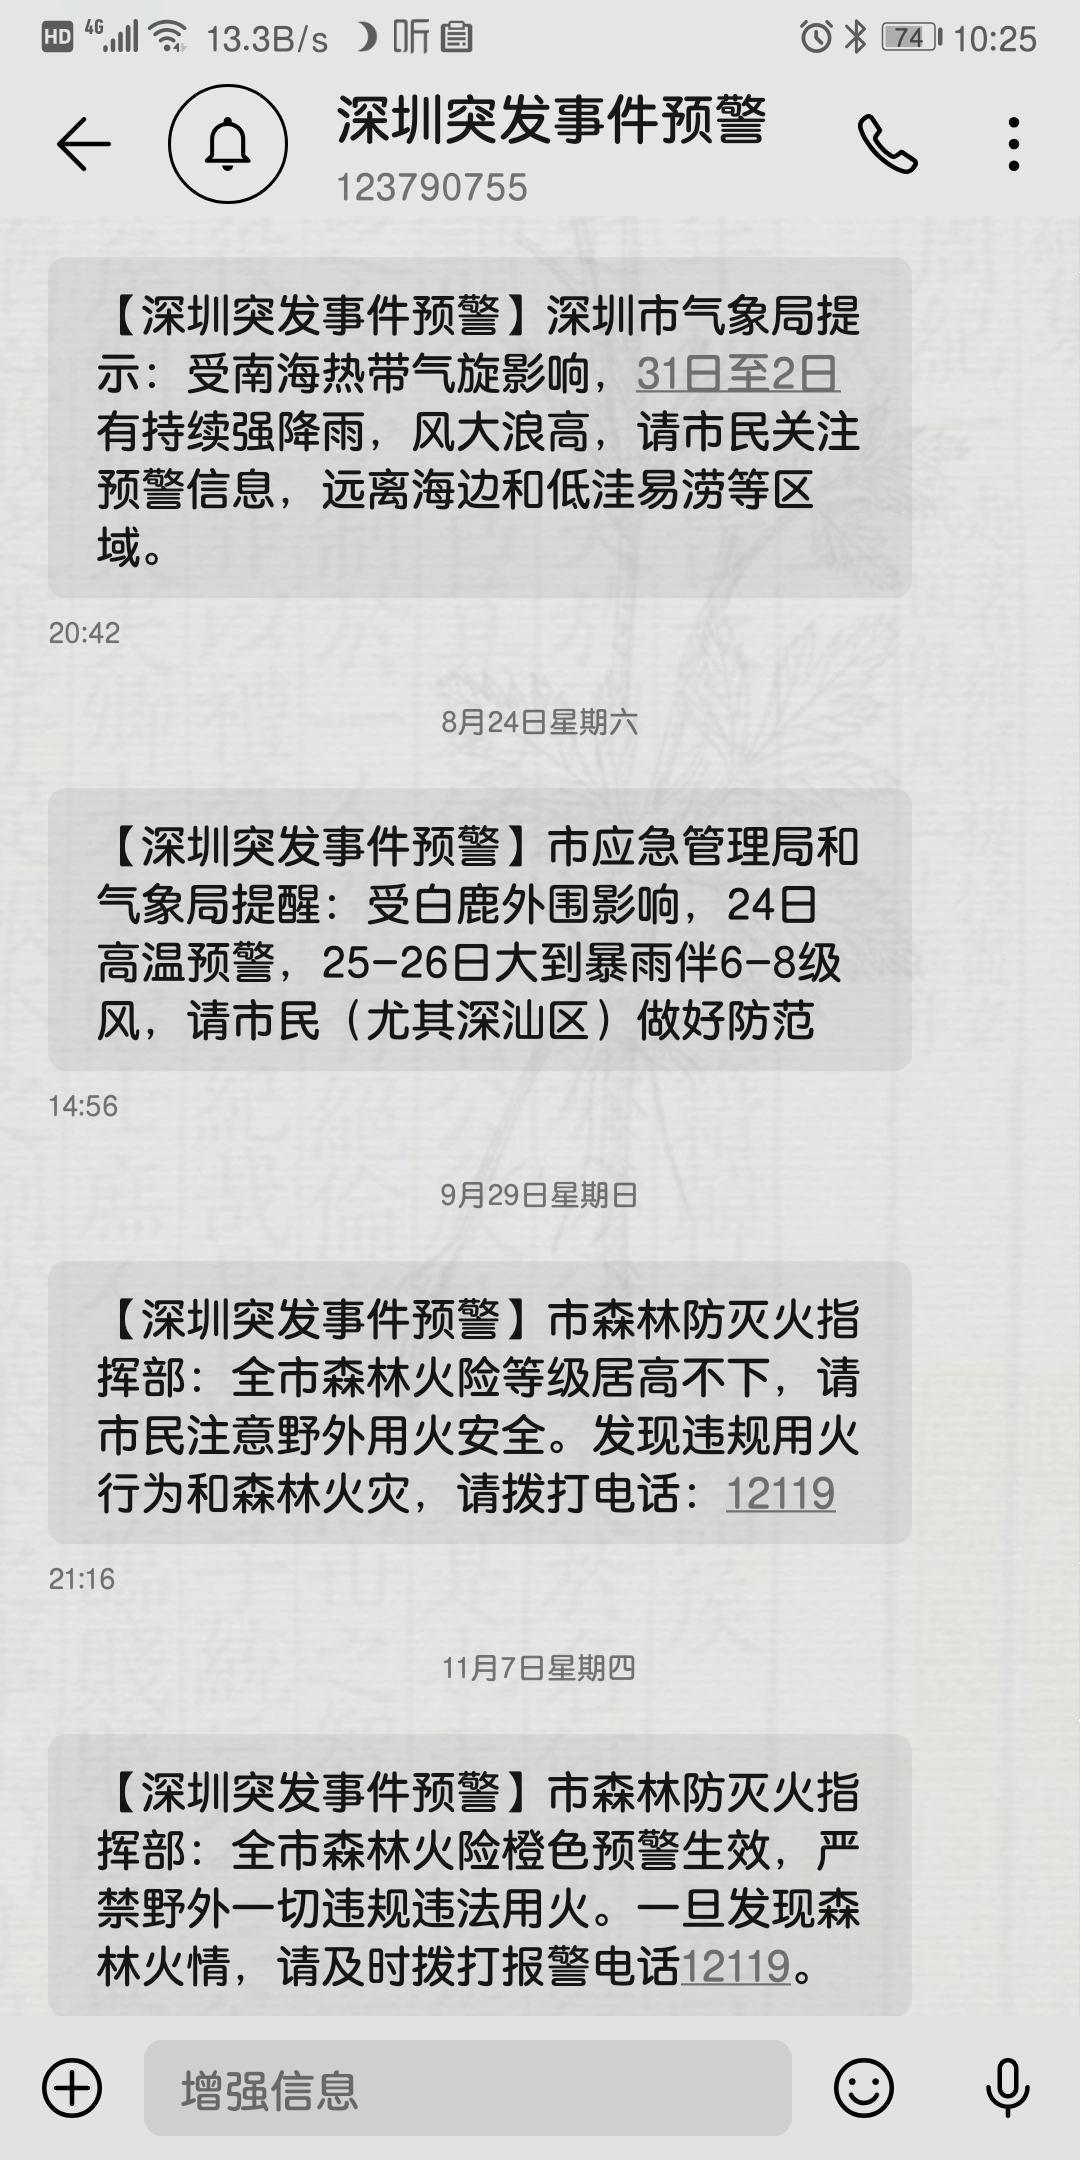 Screenshot_20191111_102516_com.android.mms.jpg